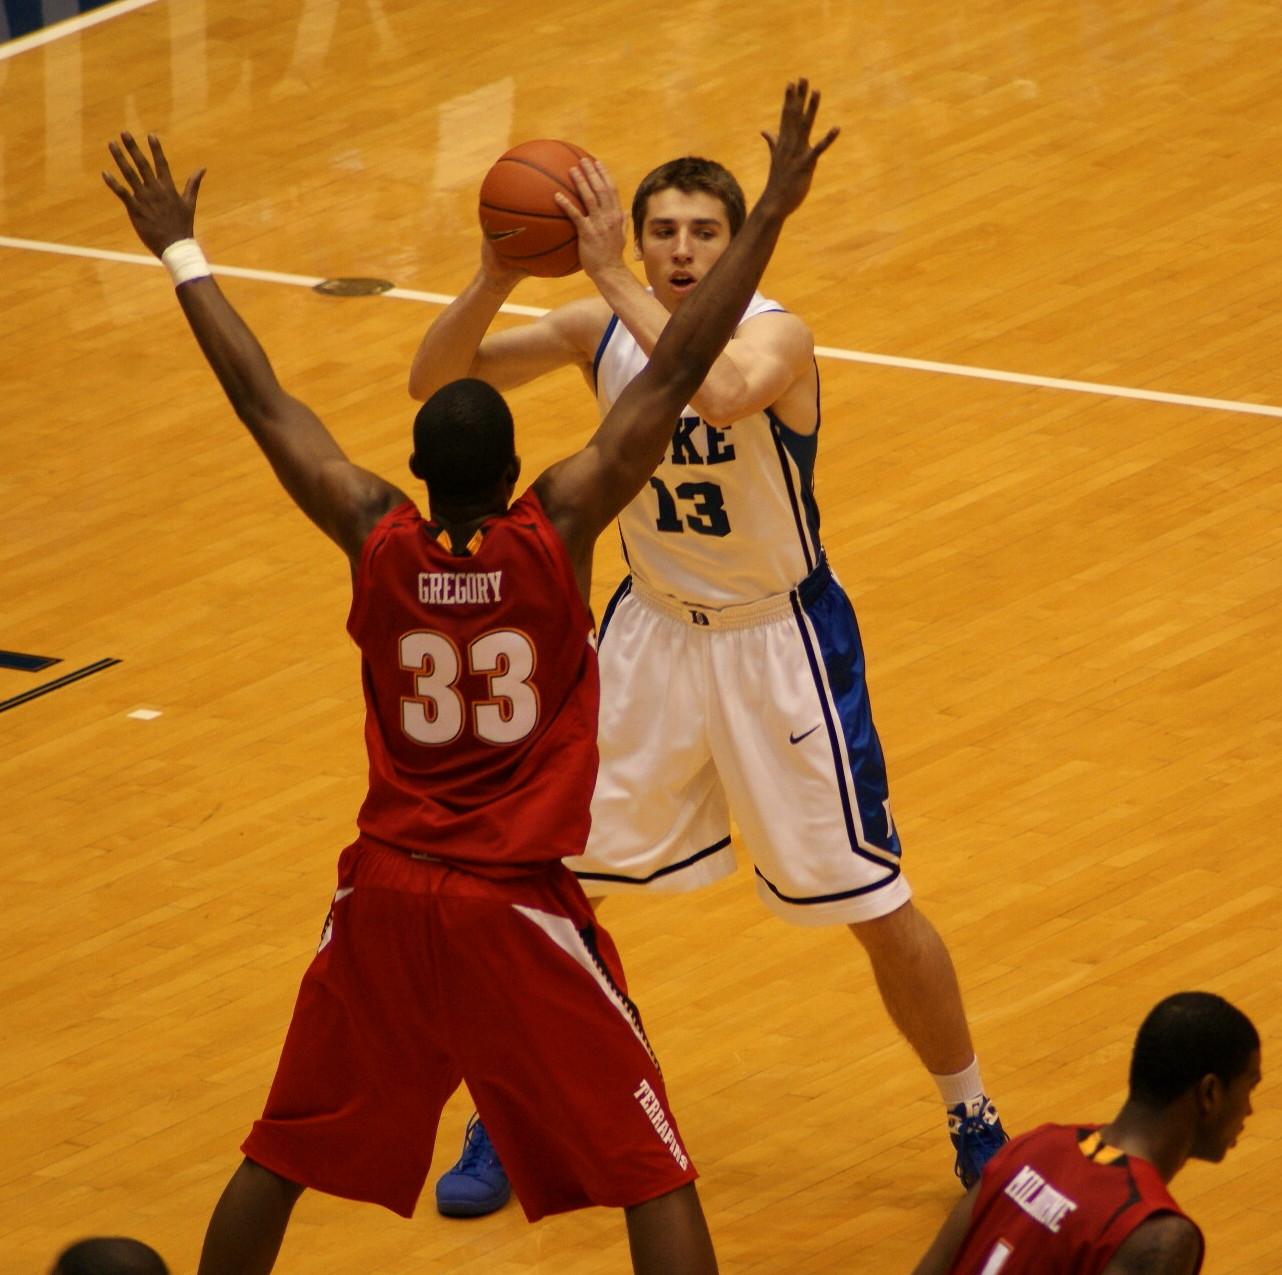 Duke freshman Olek Czyz